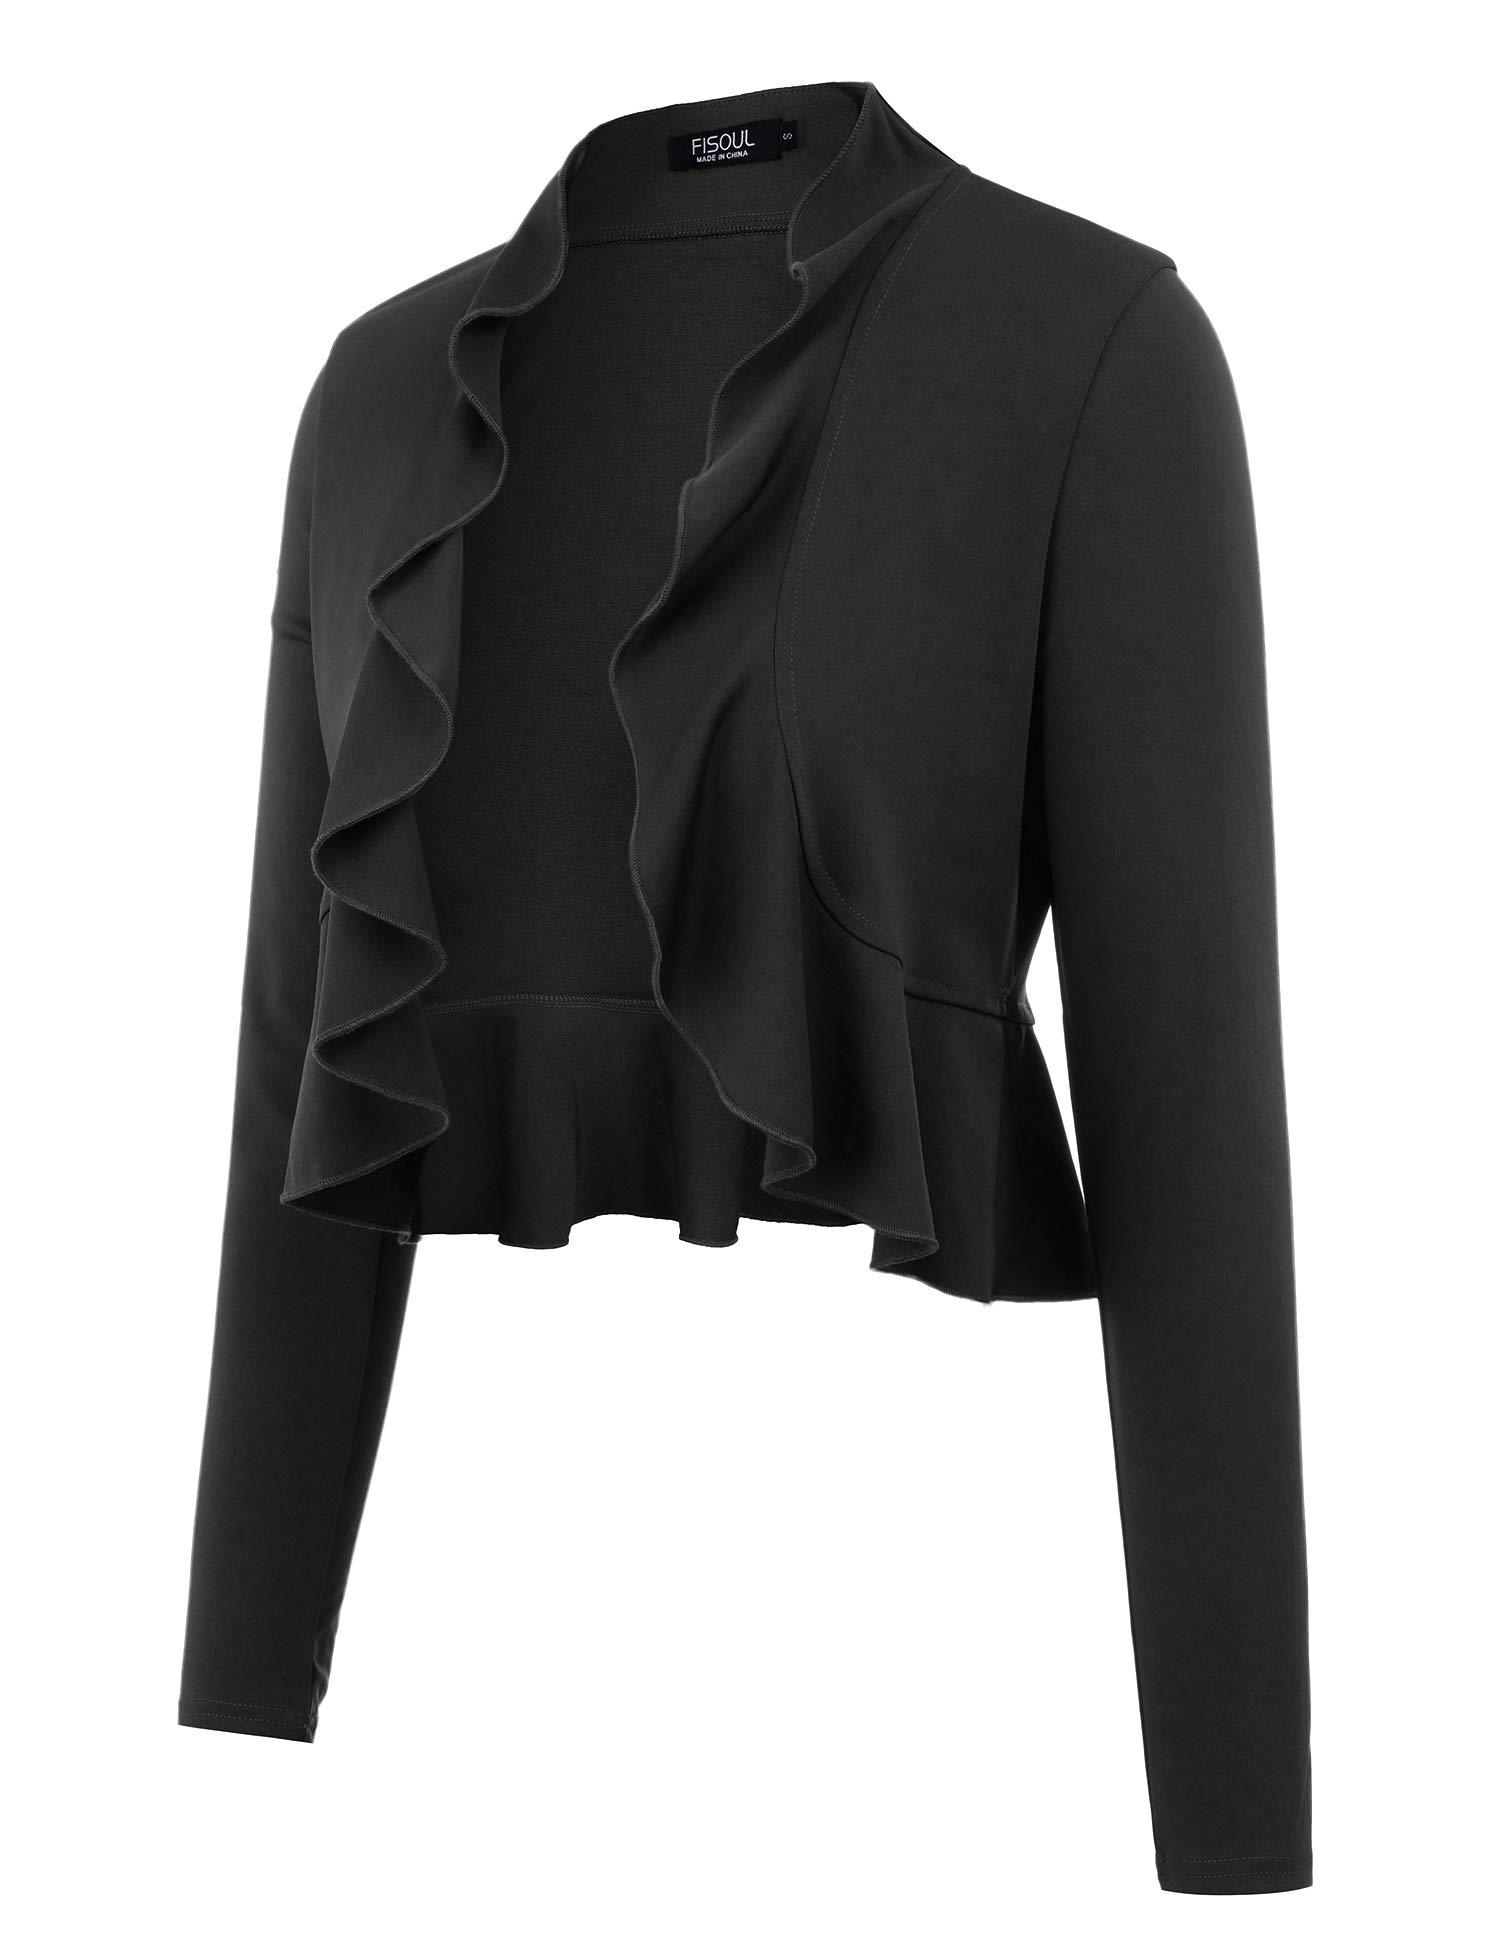 FISOUL Women's Open Front Cropped Cardigan Lone Sleeve Casual Shrugs Jacket Draped Ruffles Lightweight Sweaters Black XXL by FISOUL